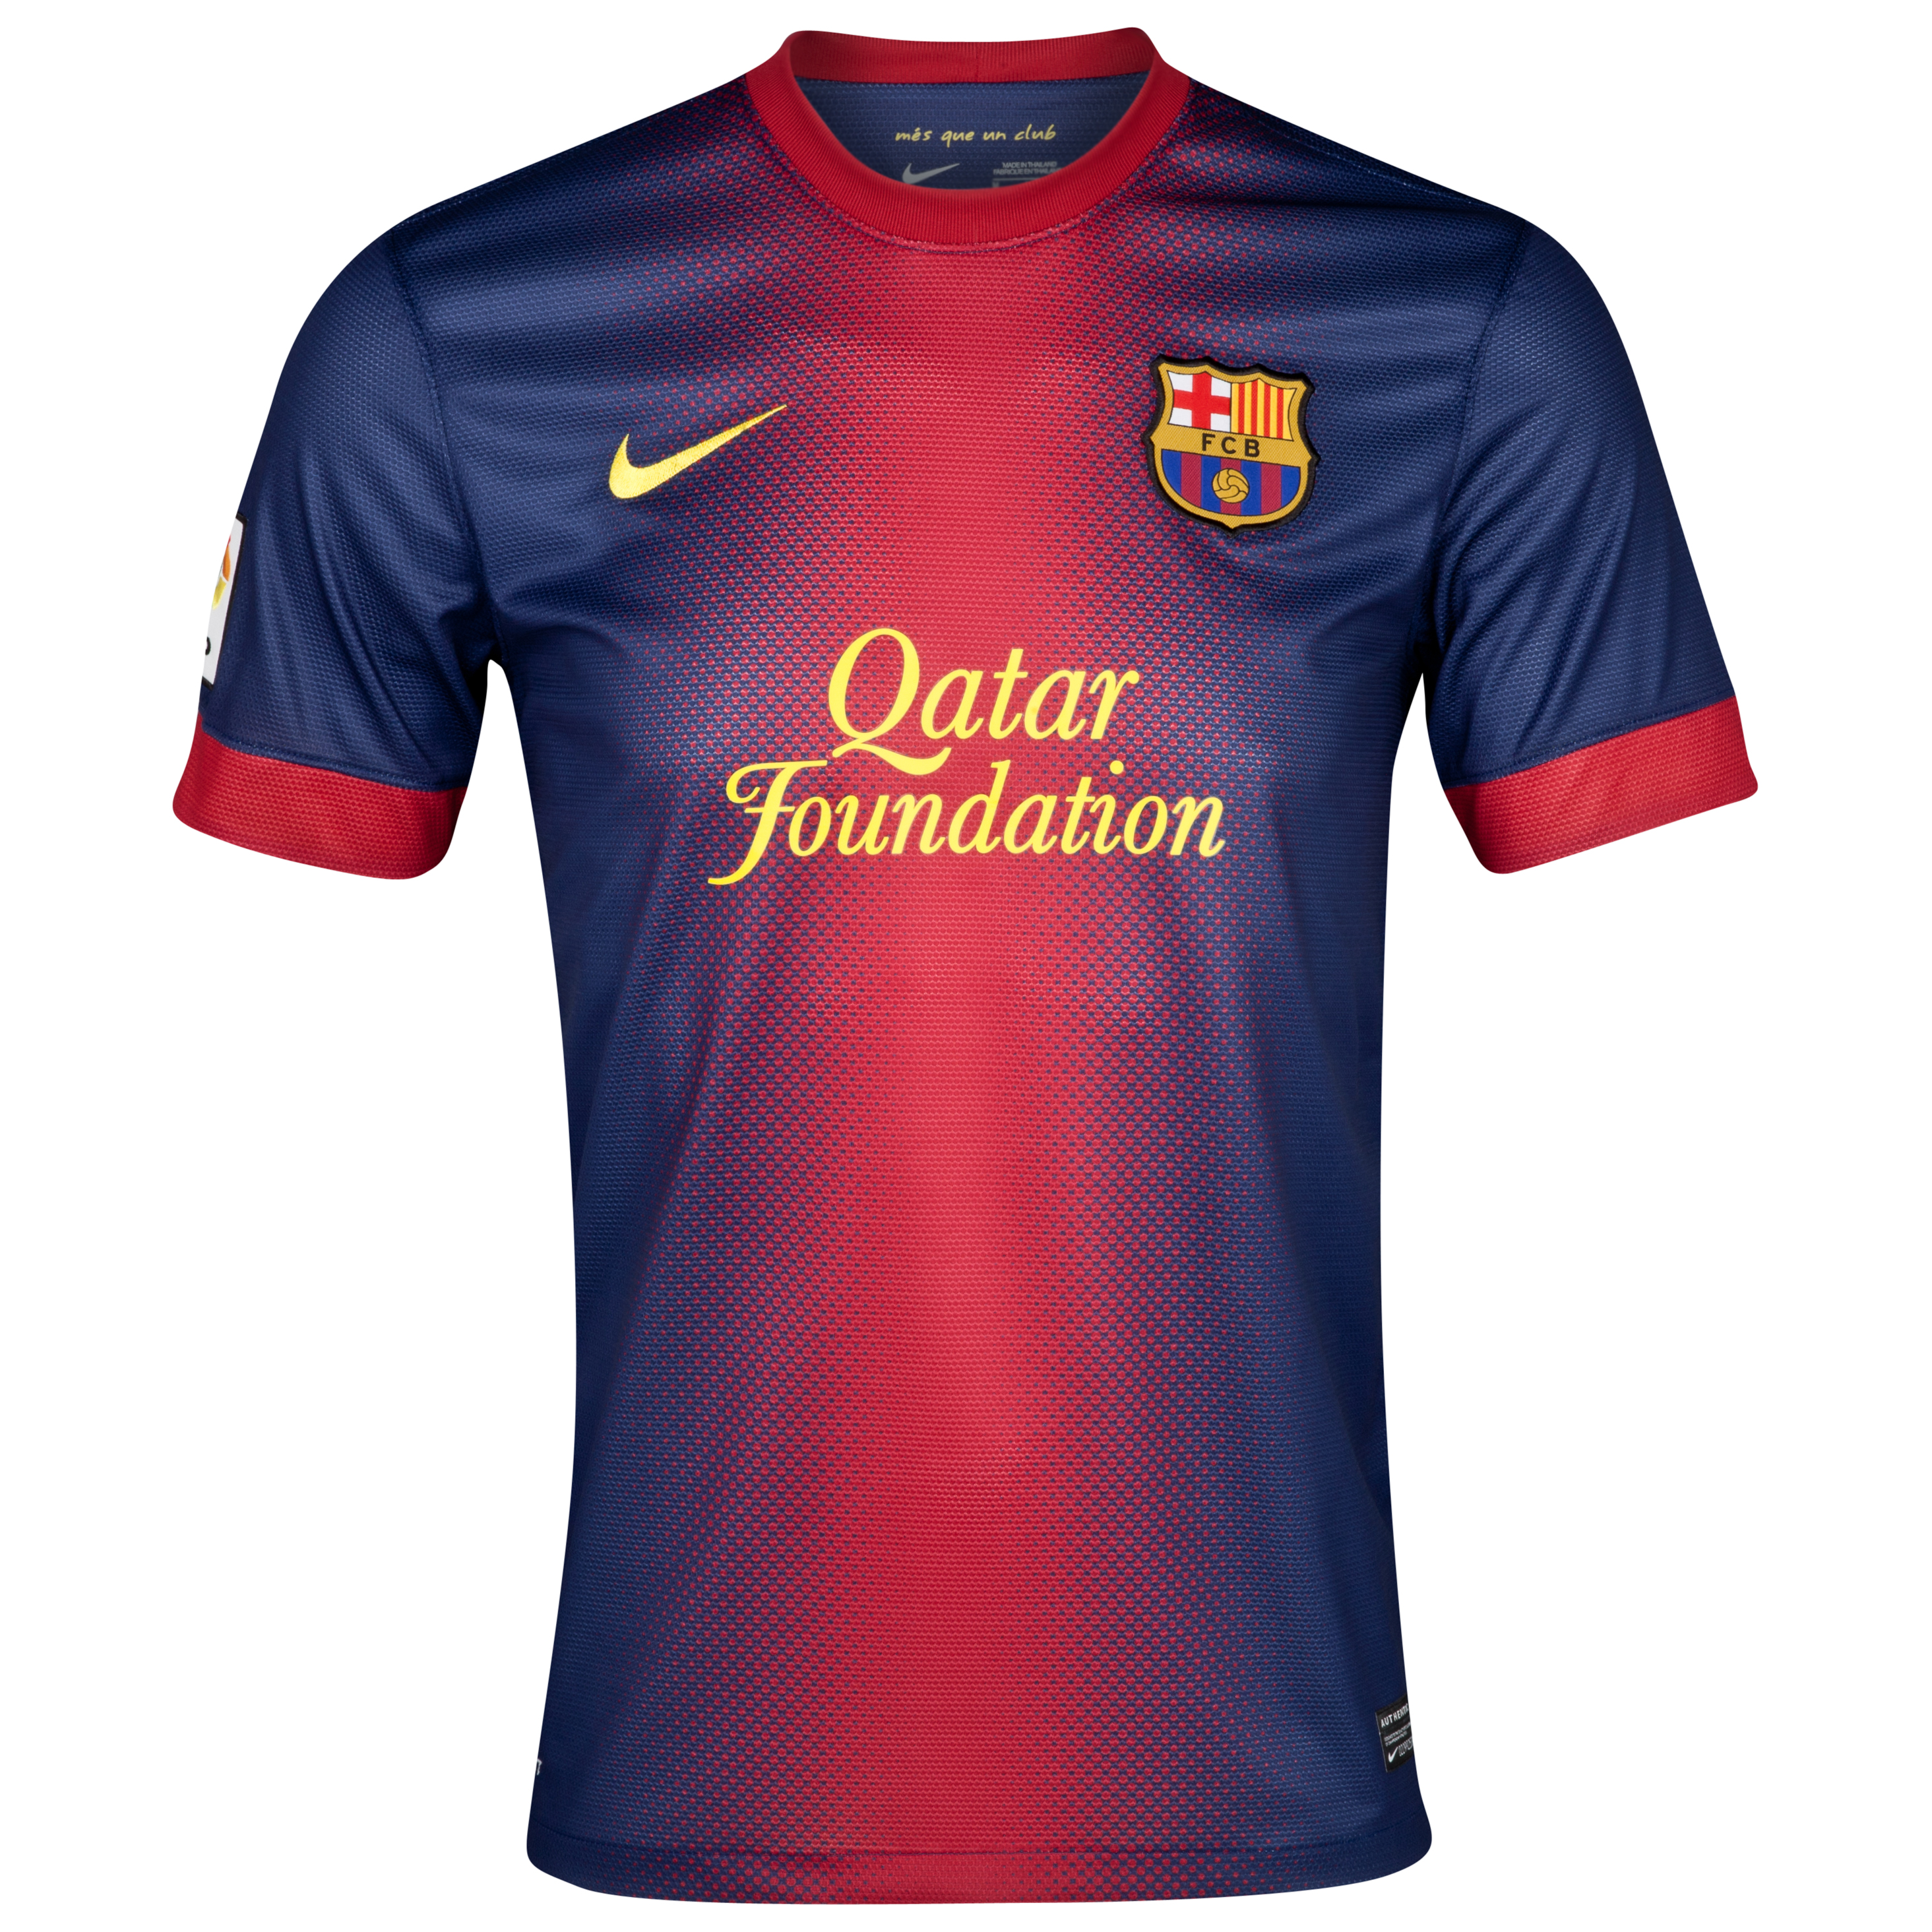 Barcelona Home Shirt 2012/13